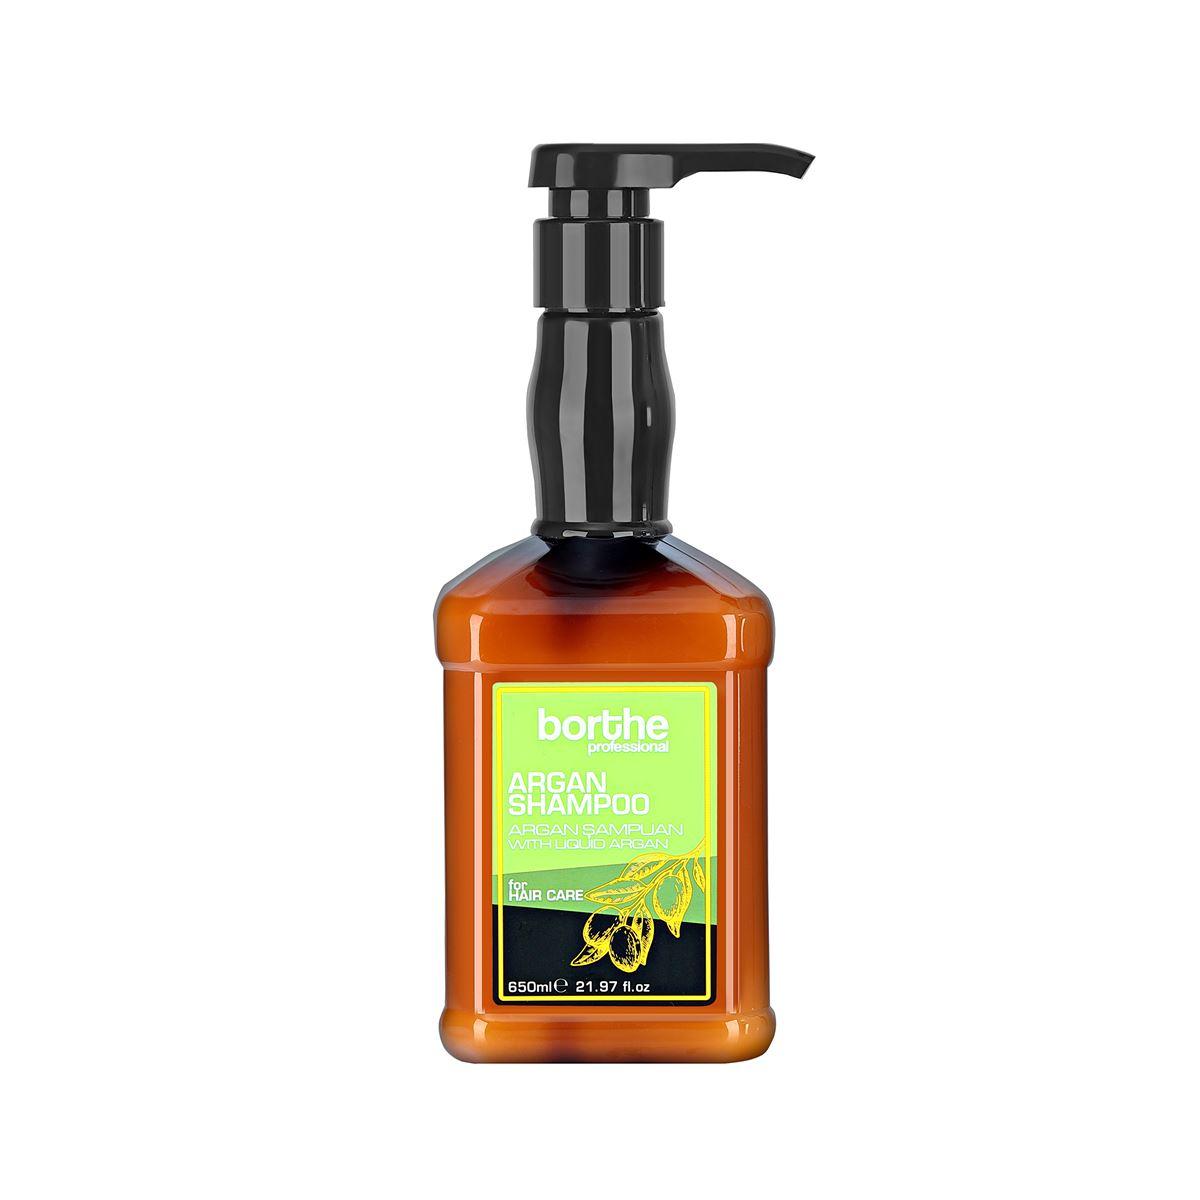 Borthe Argan Shampoo 650 ml.